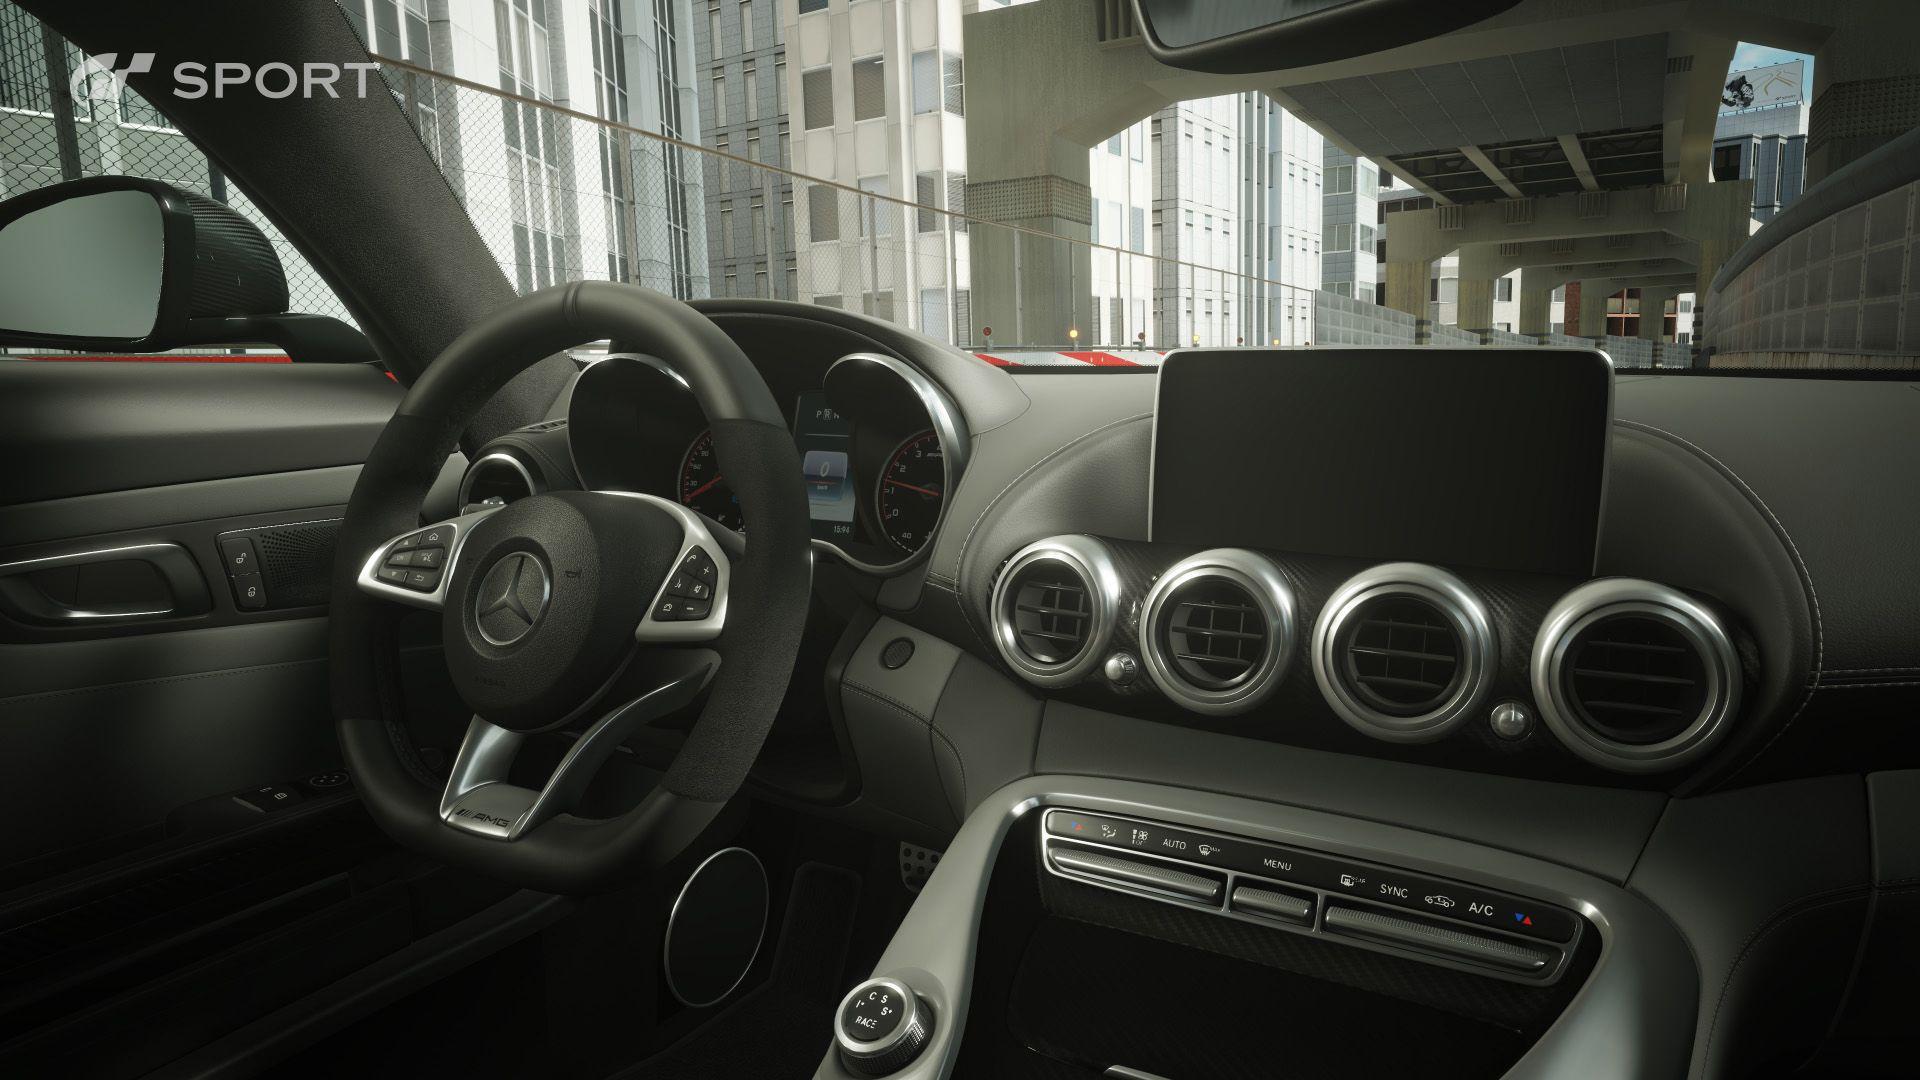 interior_mercedes_amg8suhl.jpg